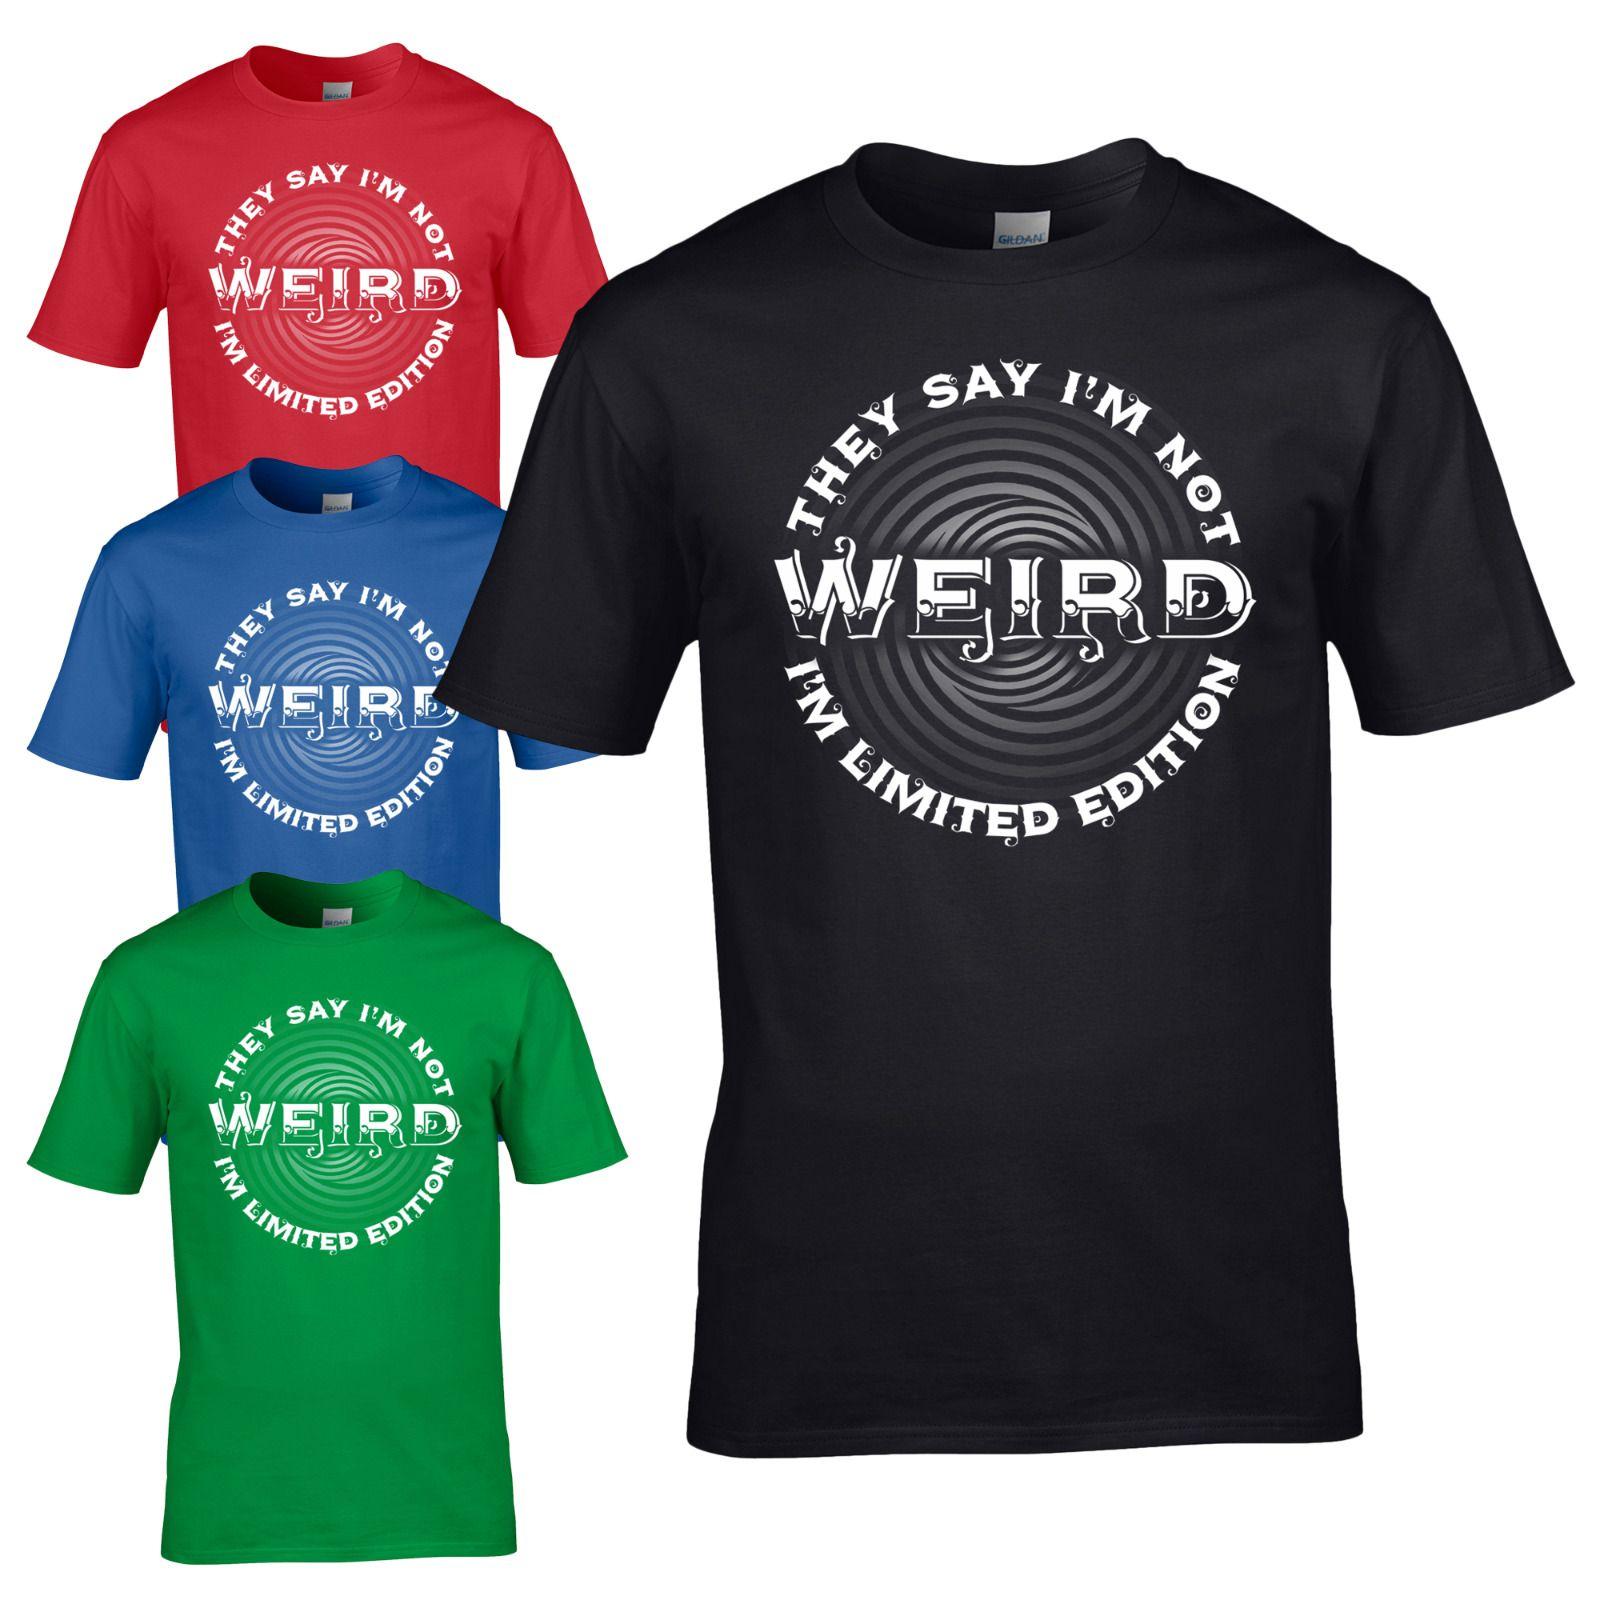 ac100456 Cheap Funny Printed T Shirts - DREAMWORKS